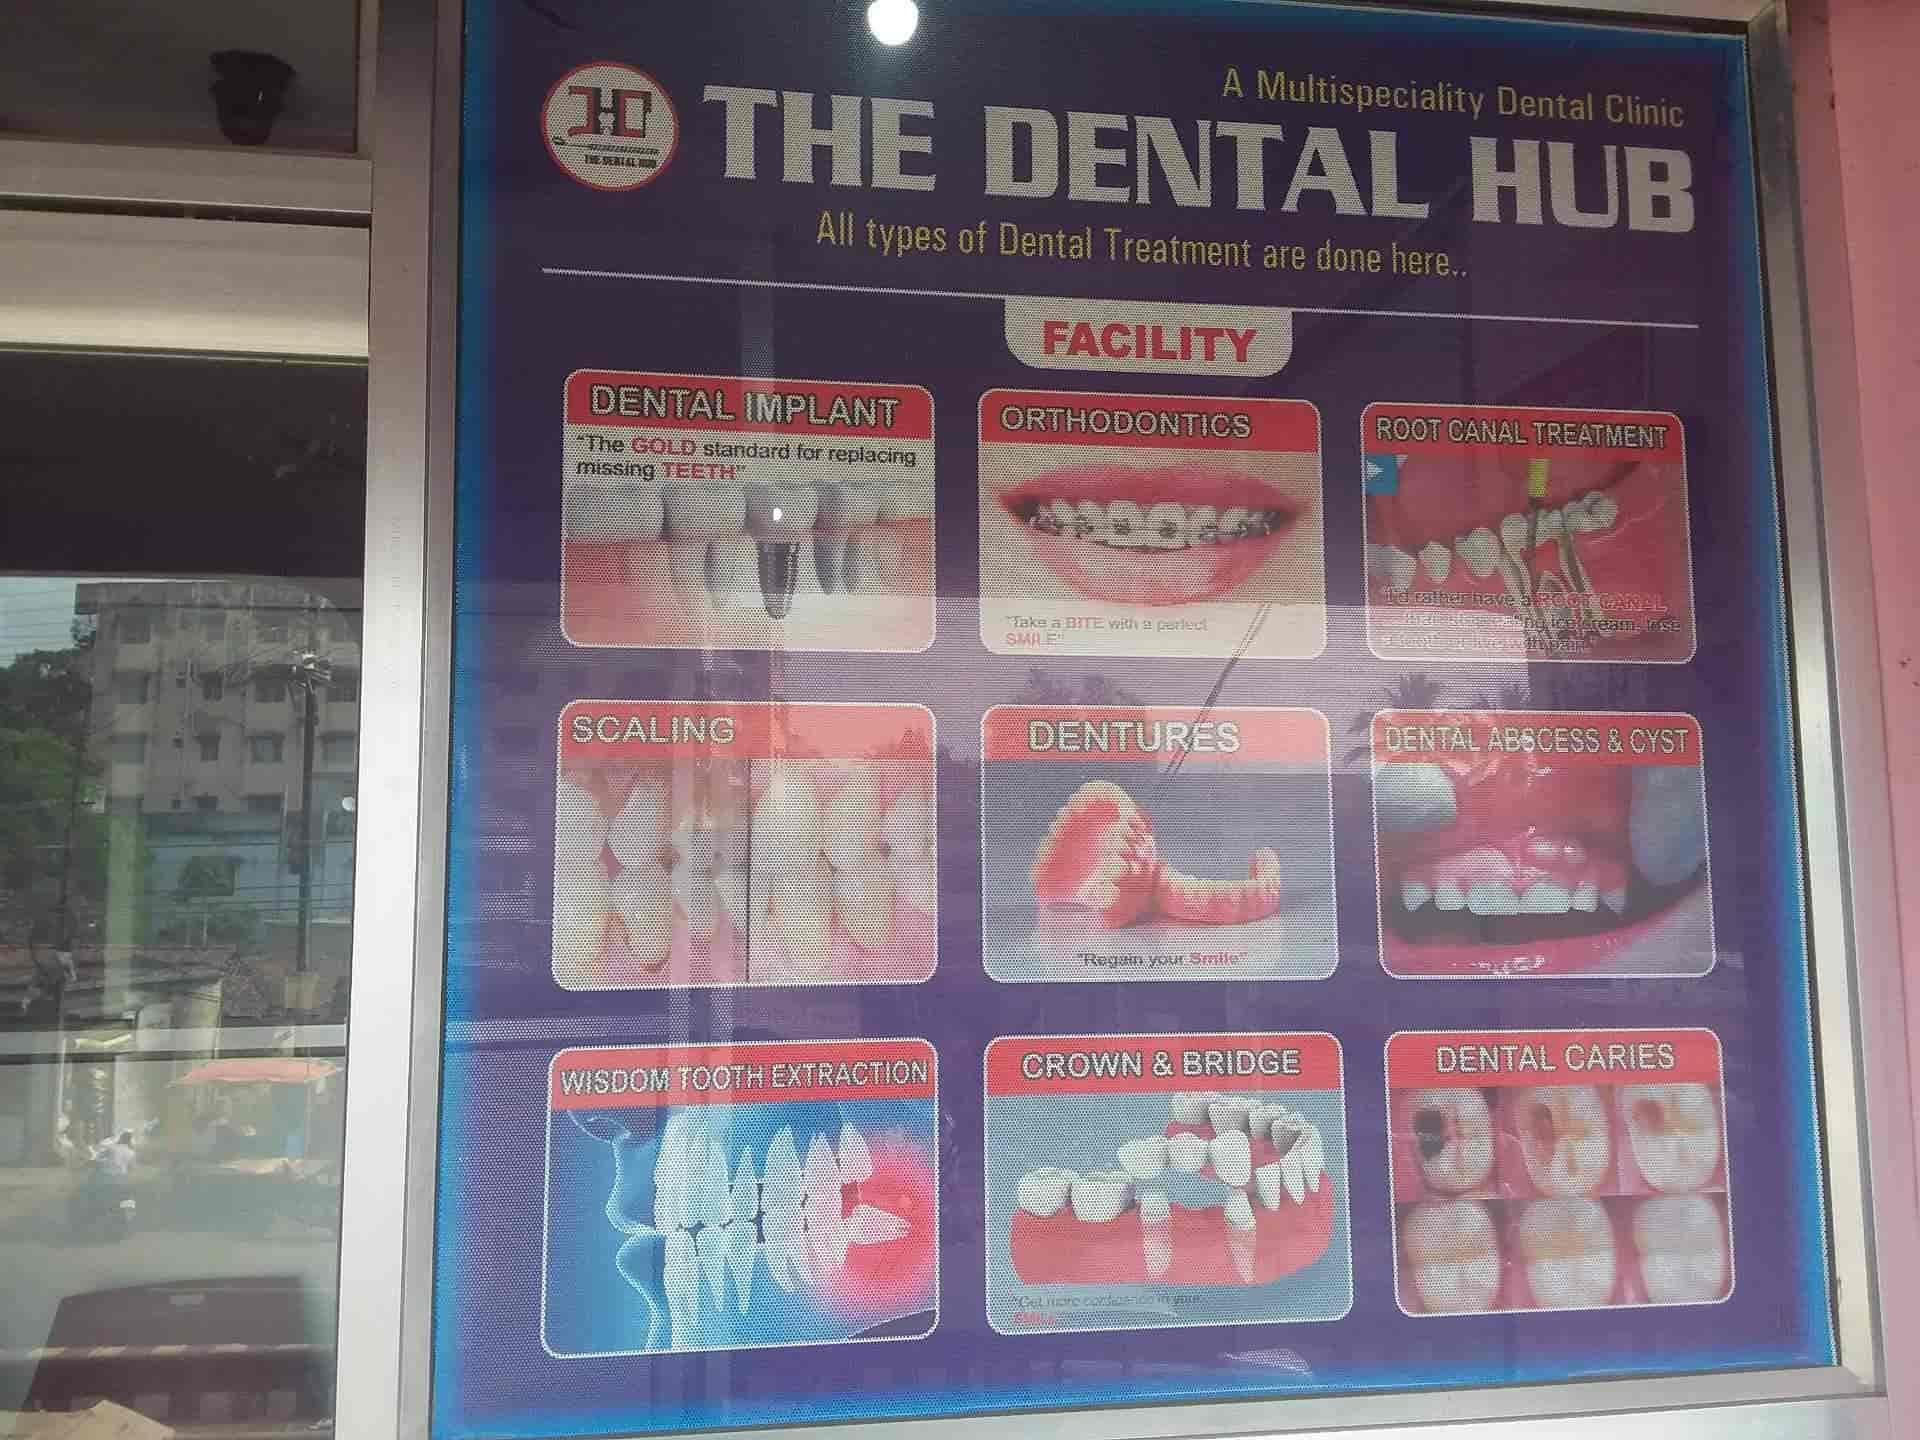 The Dental Hub, Dhanbad Ho - Dentists in Dhanbad - Justdial